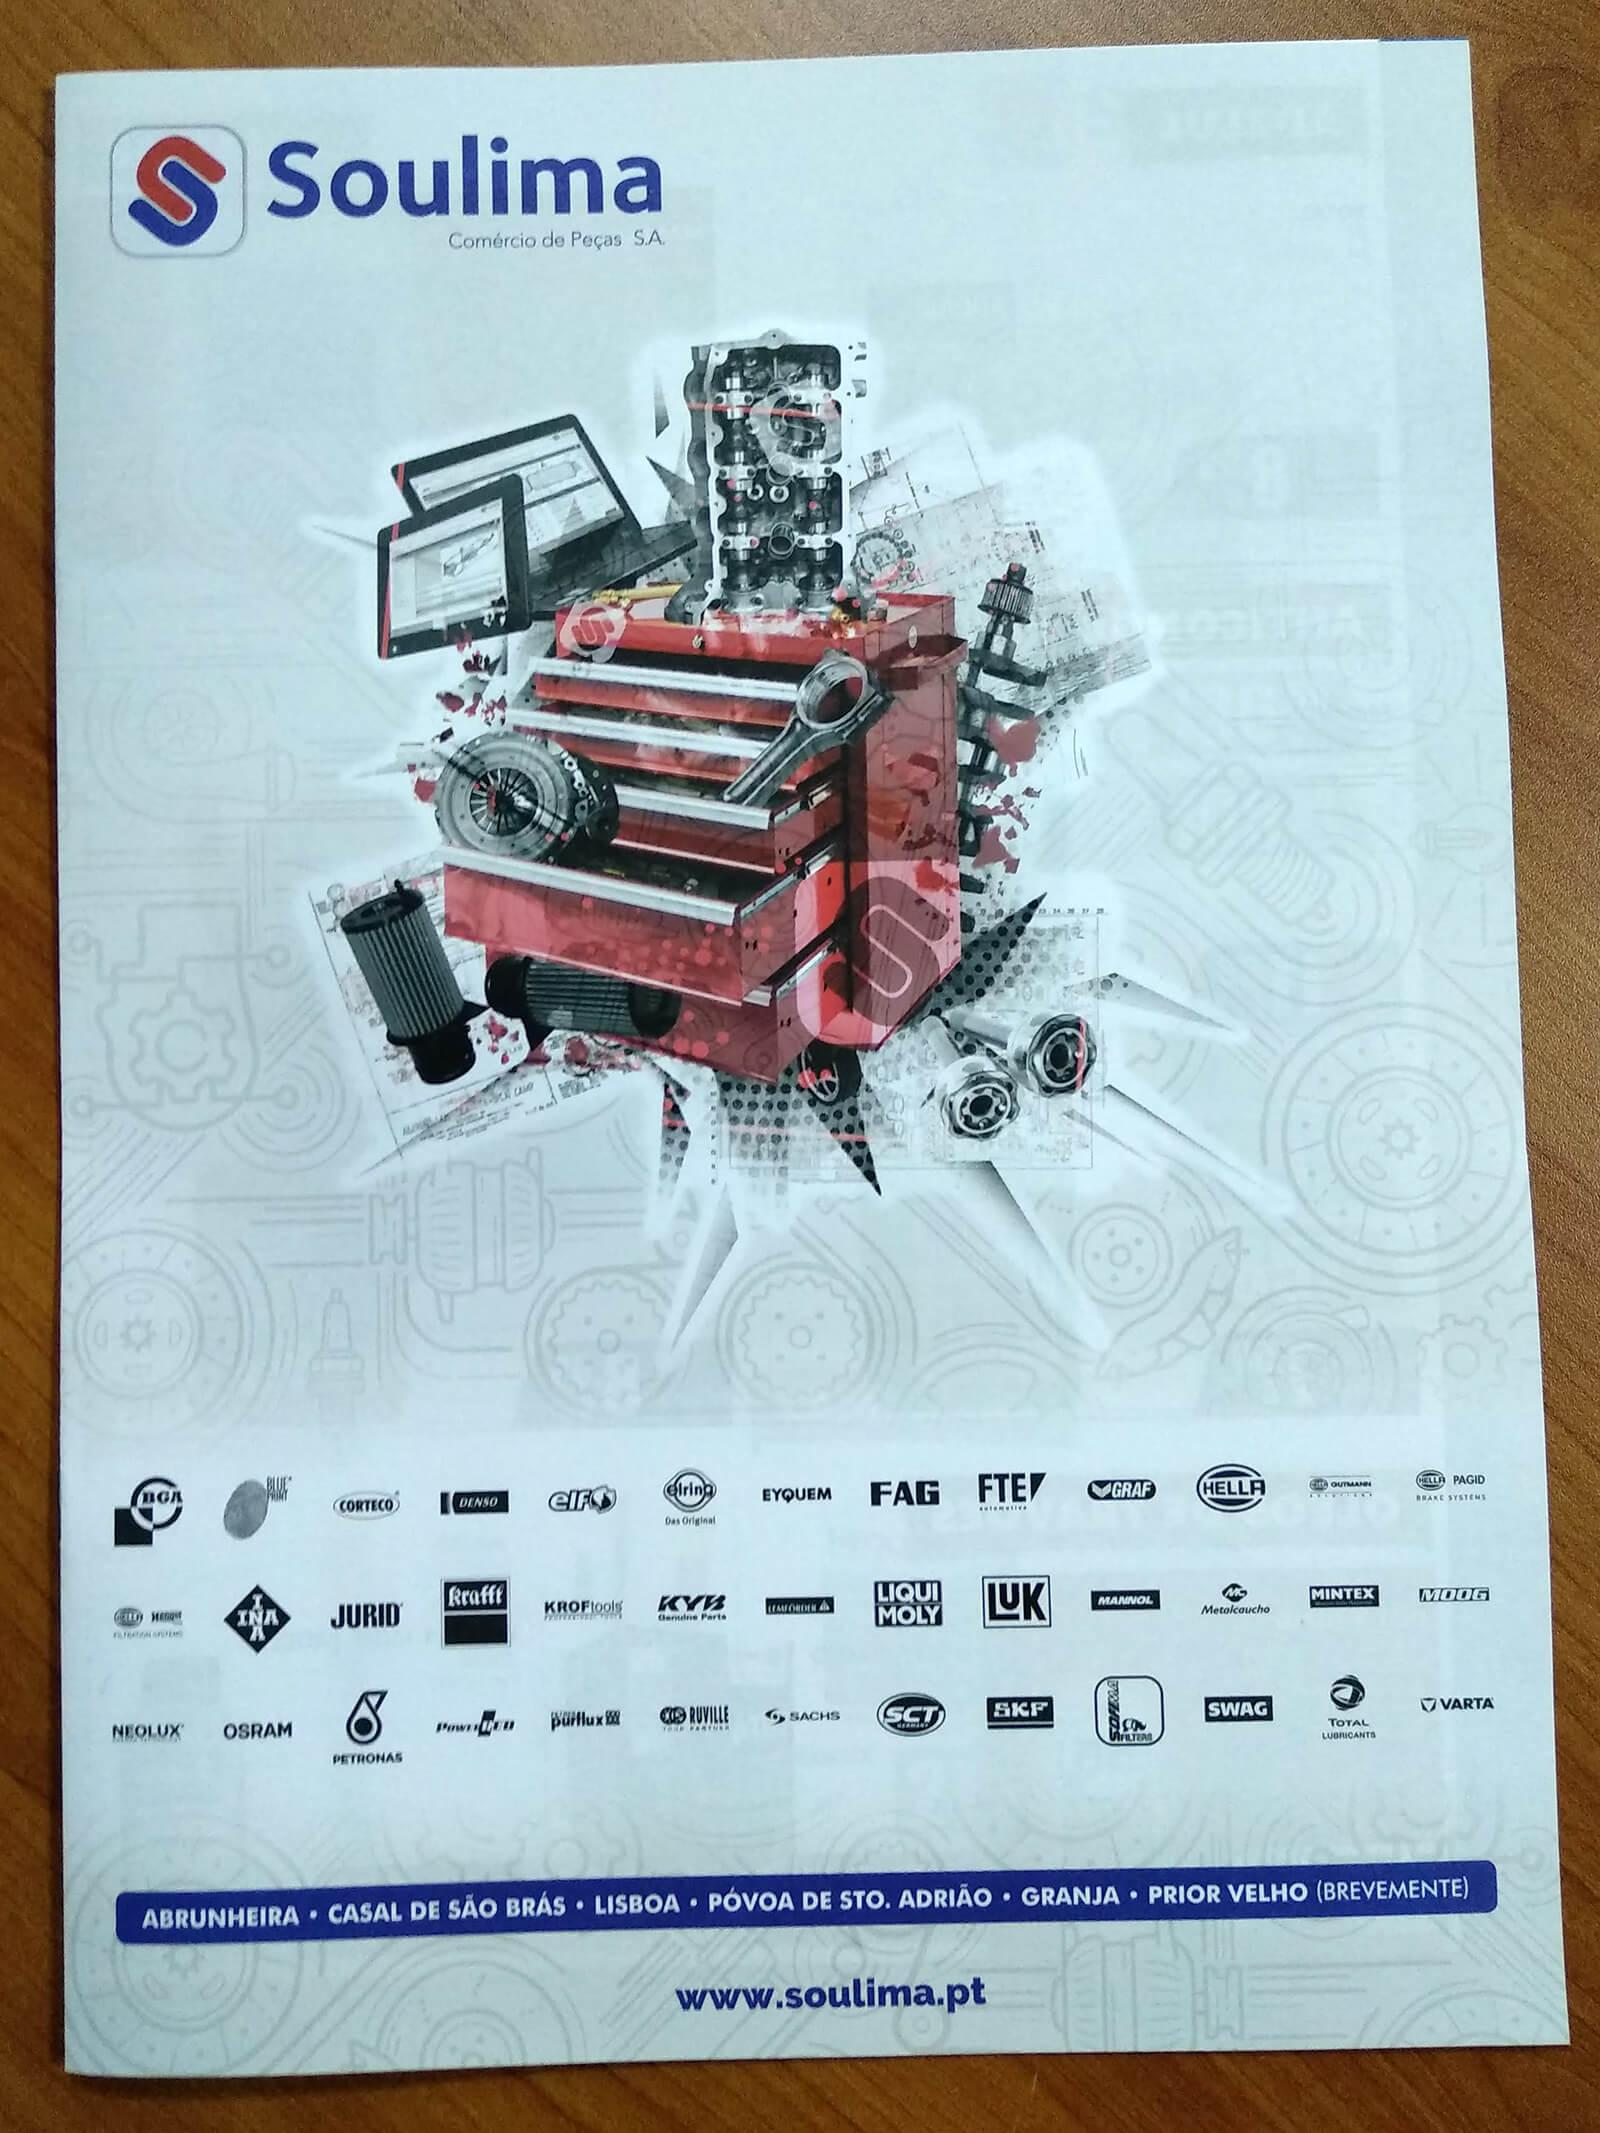 Soulima - Comércio de Peças - Printed Brochure Soulima - Cover | Way2Start - Design & Digital Agency